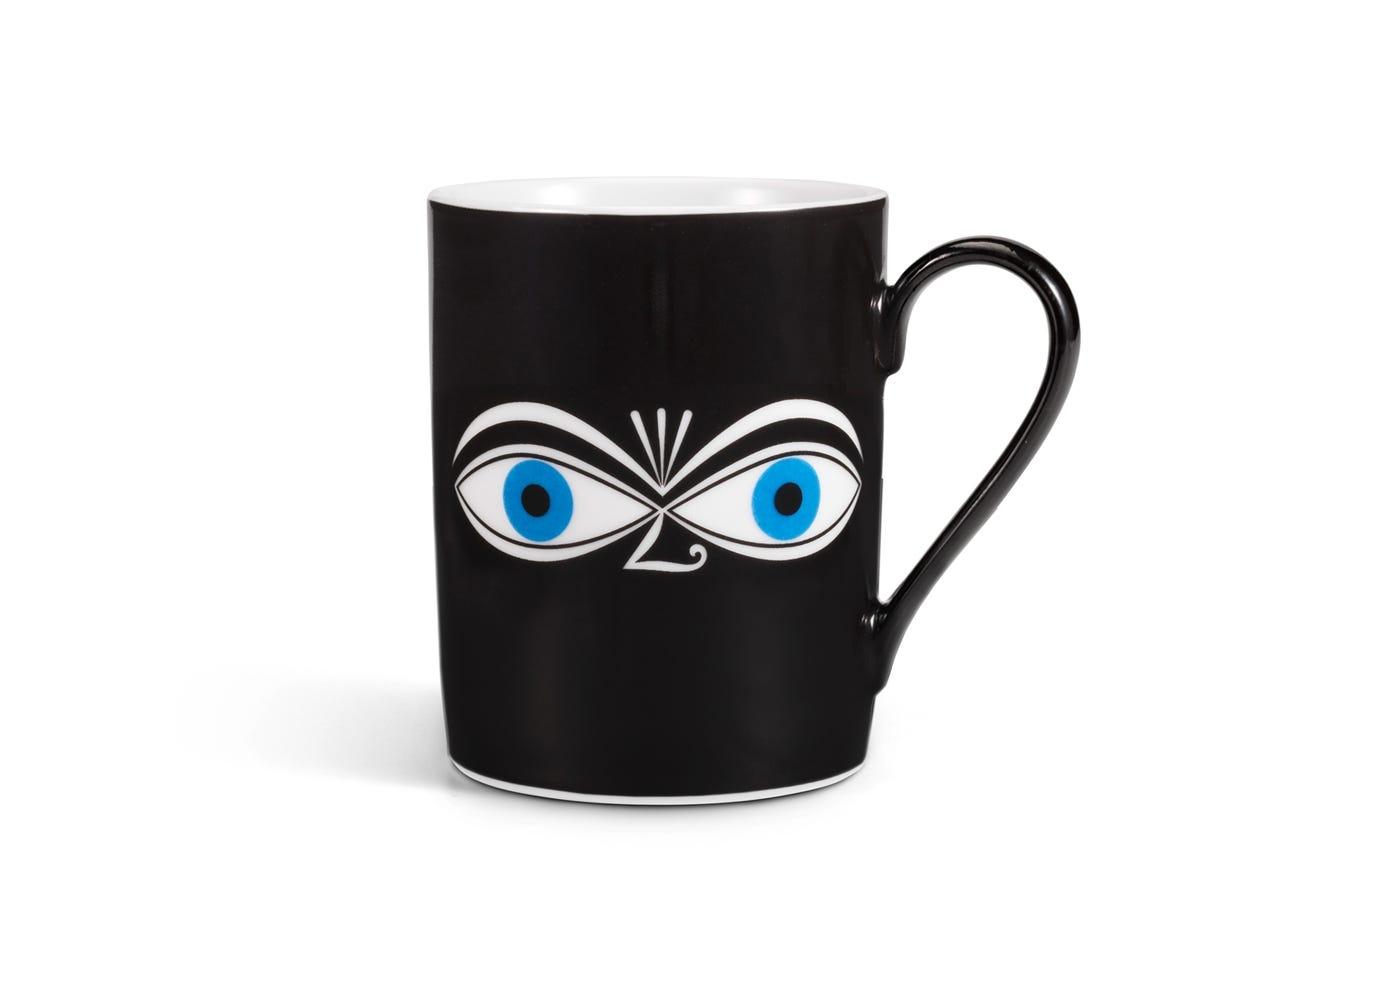 Coffee Mug Eyes Design by Alexander Girard in Blue